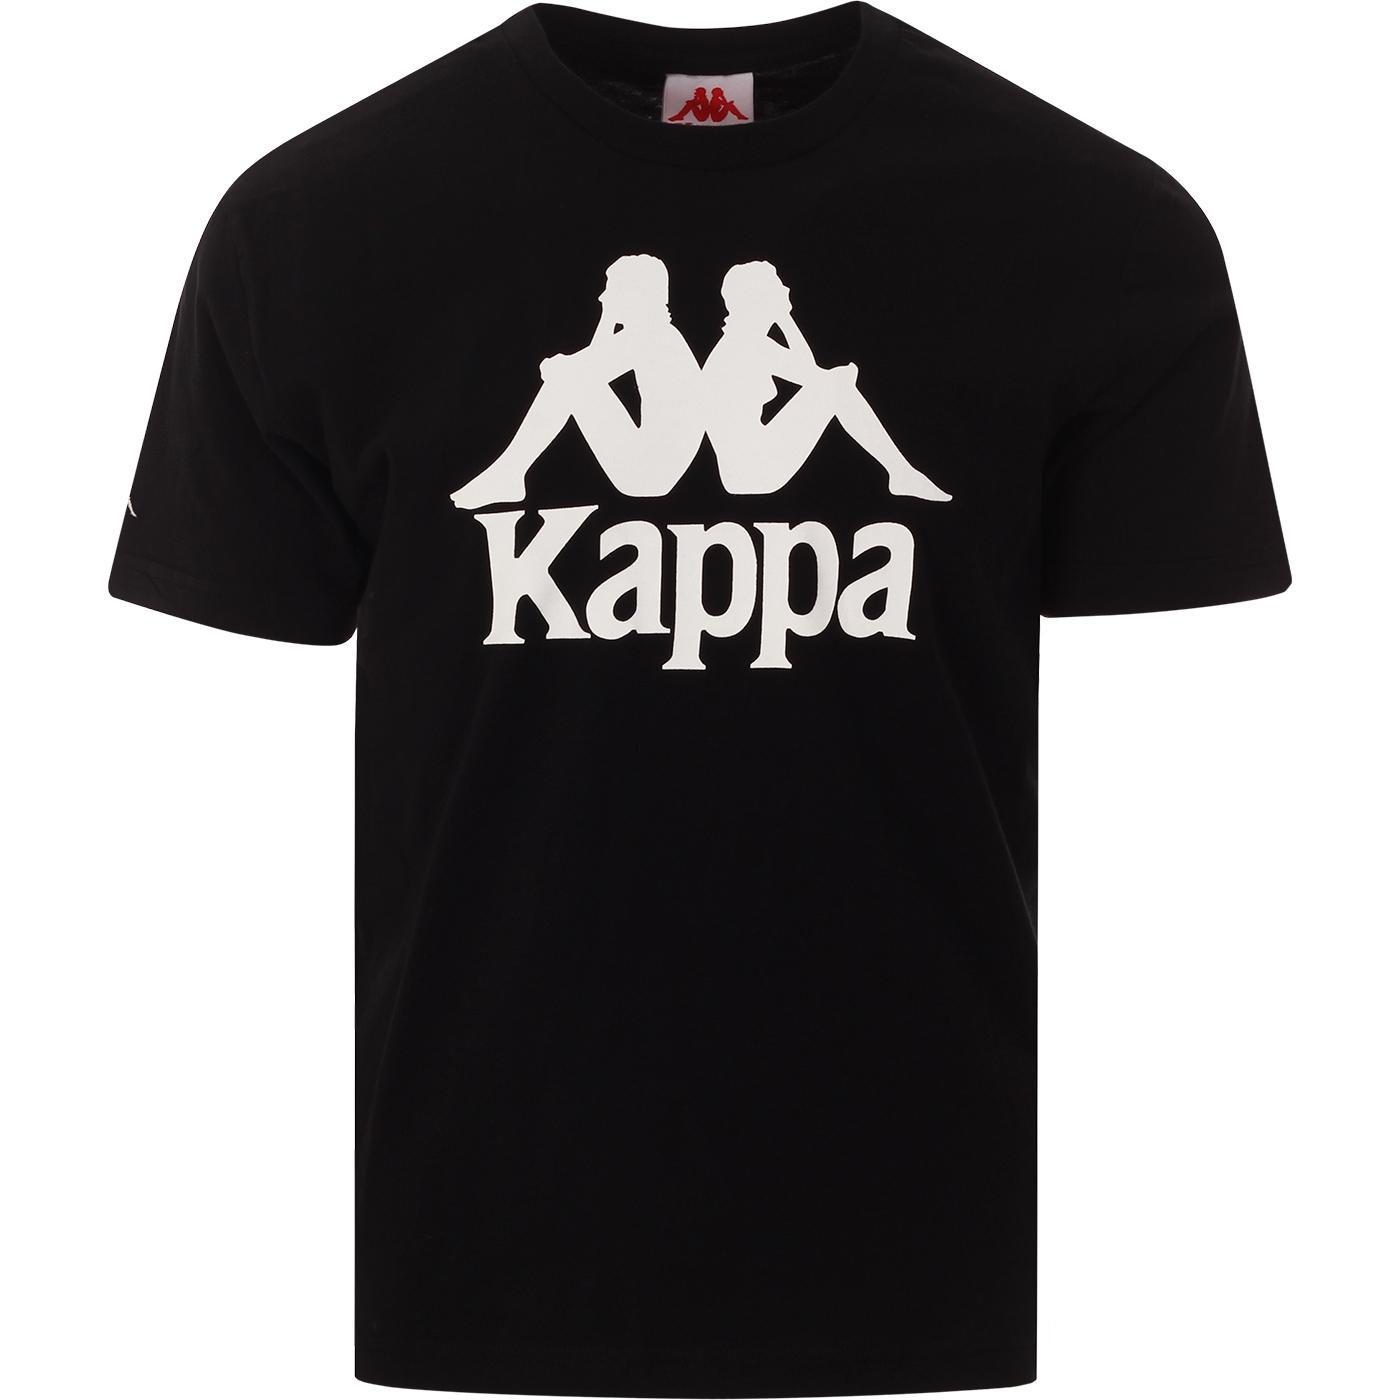 Tahiti KAPPA Retro 90s Omni Logo Tee (Black/White)